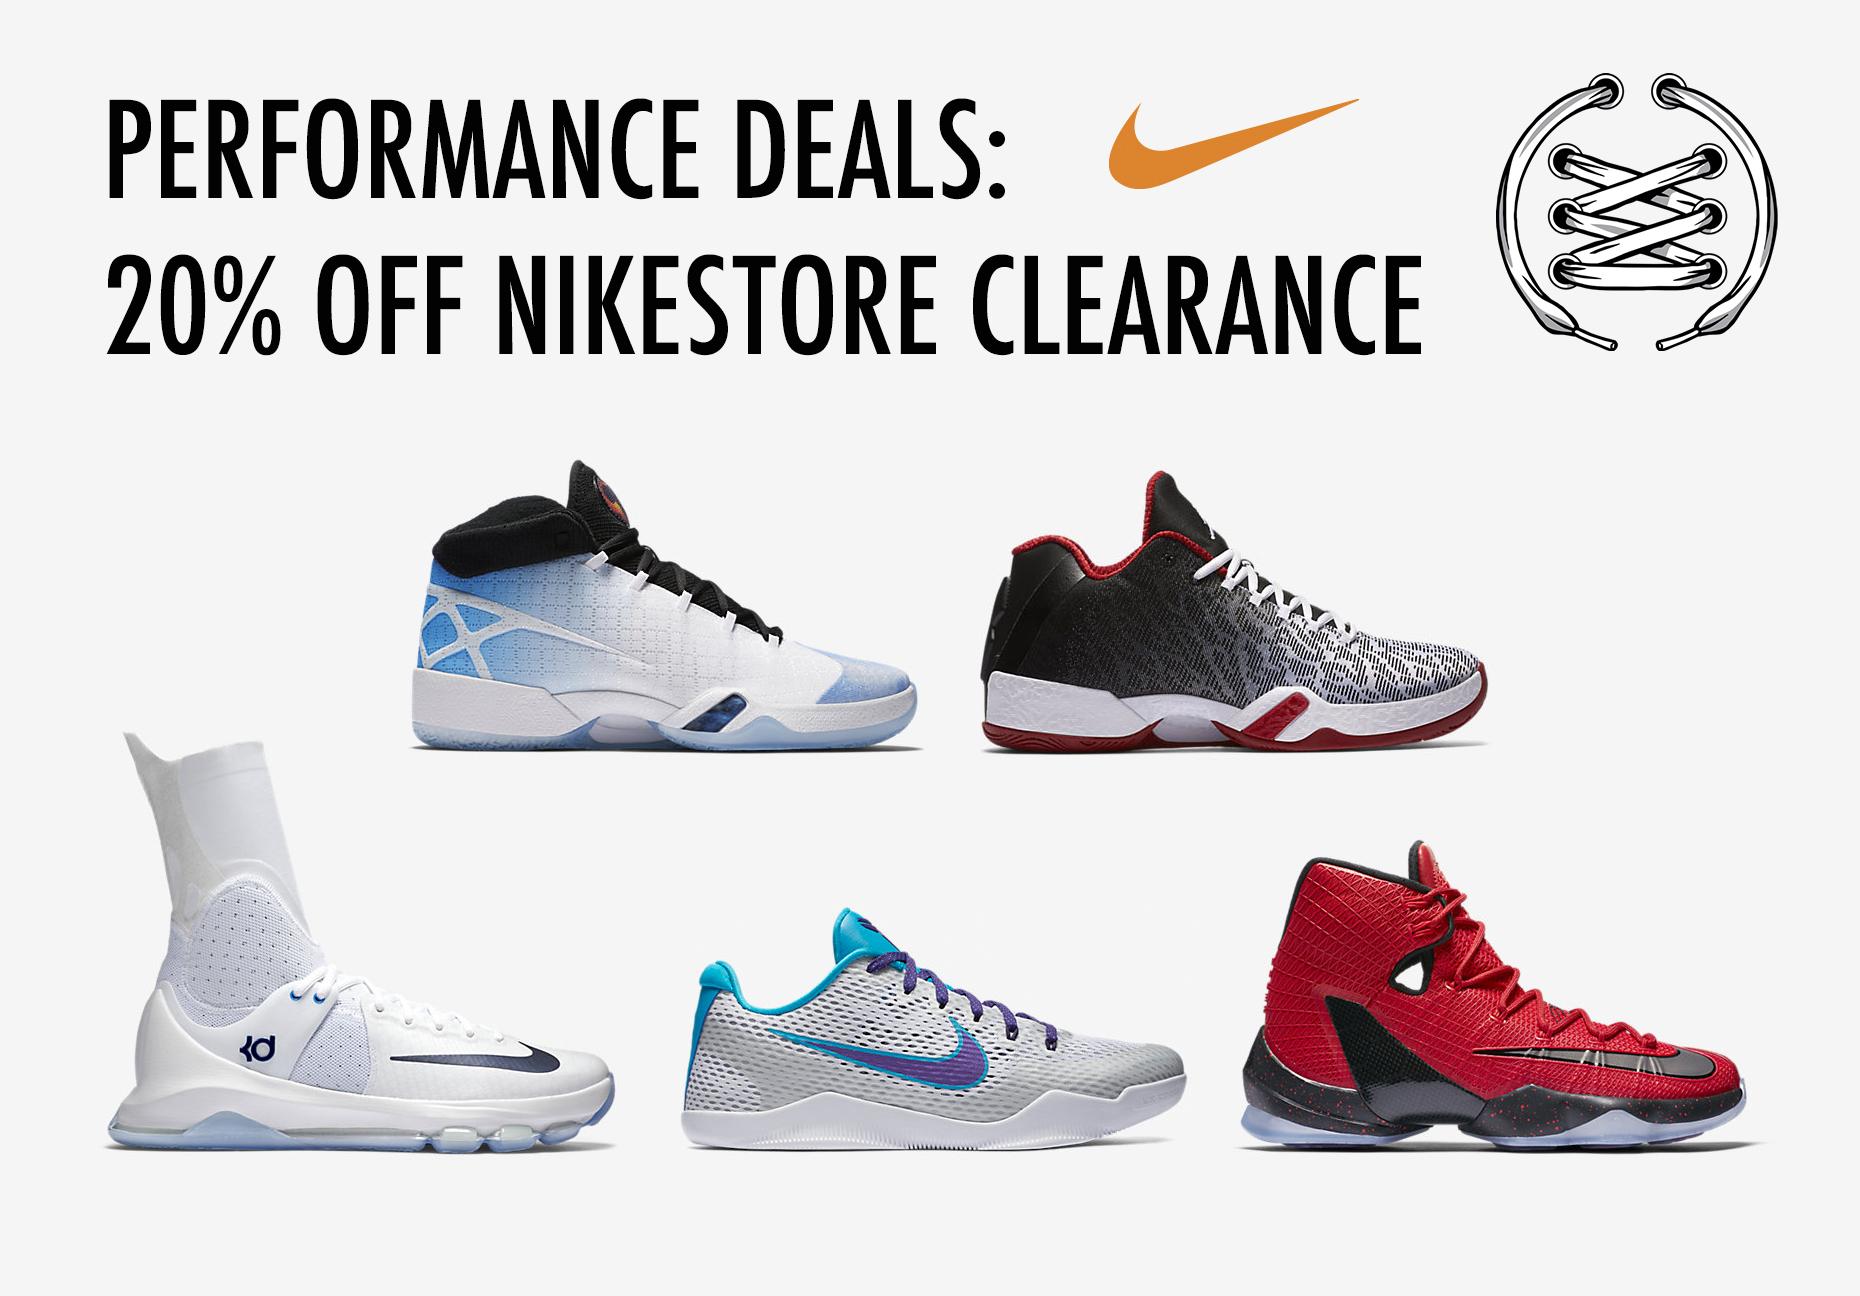 nike performance deals copy